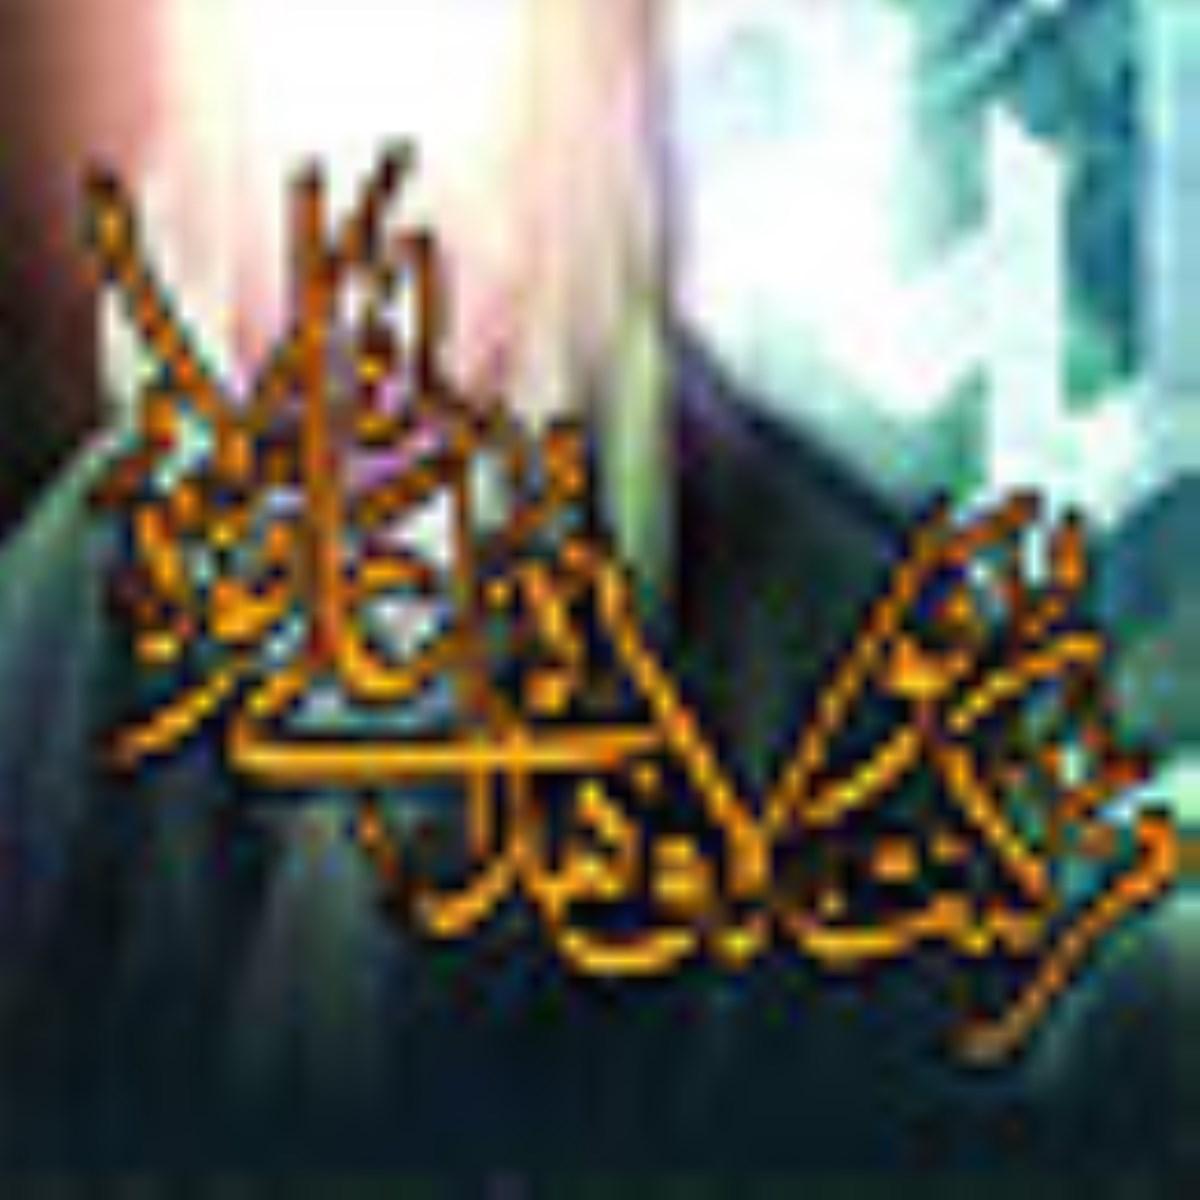 اشارات مستقيم به ولايت حضرت علي(ع) در خطبه غدير